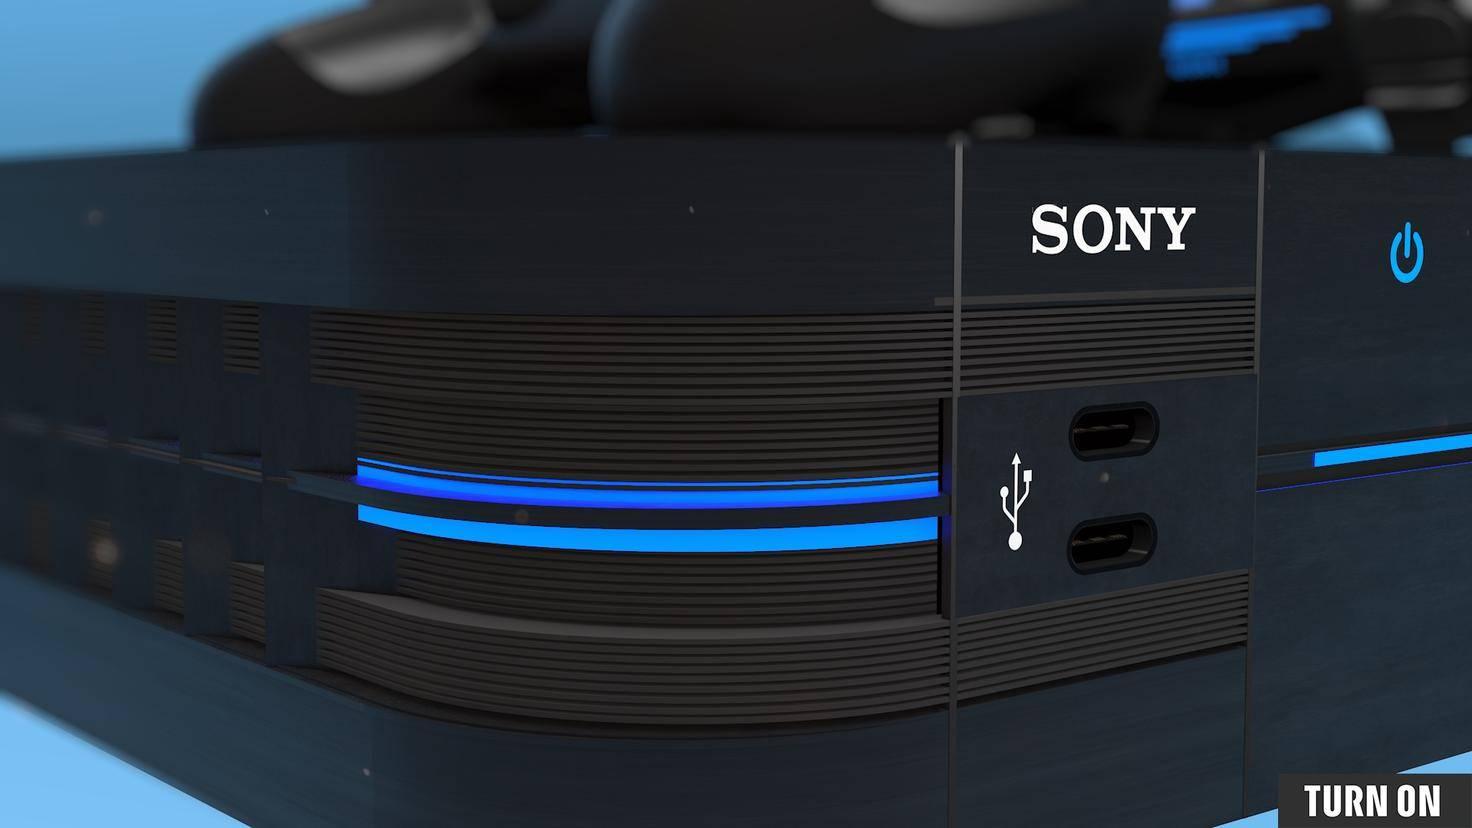 ps5-playstation-5-konzept-turn-on-usb-c-slots